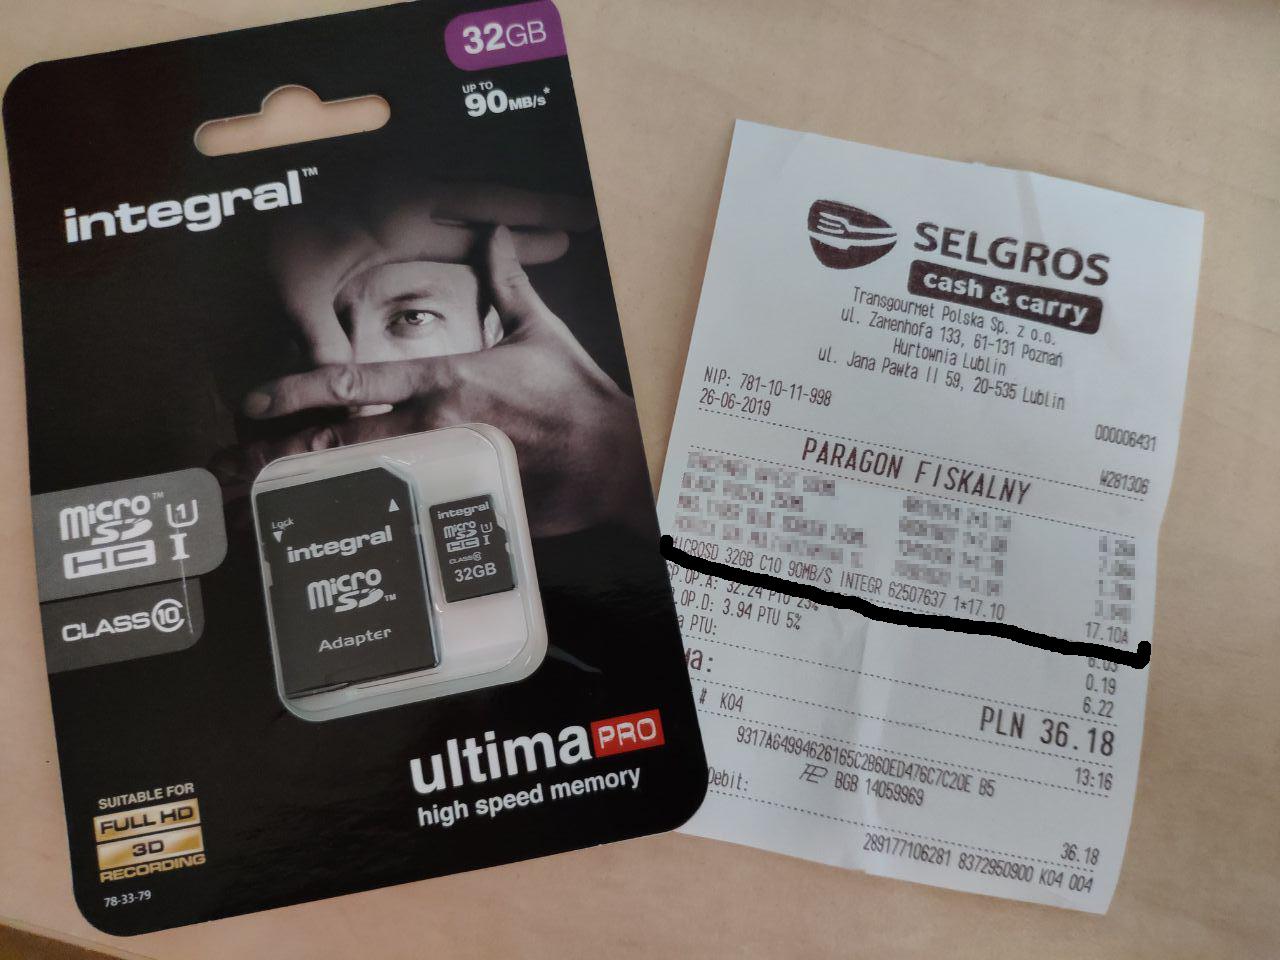 Karta pamięci MicroSD Integral Ultima Pro 32GB @Selgros